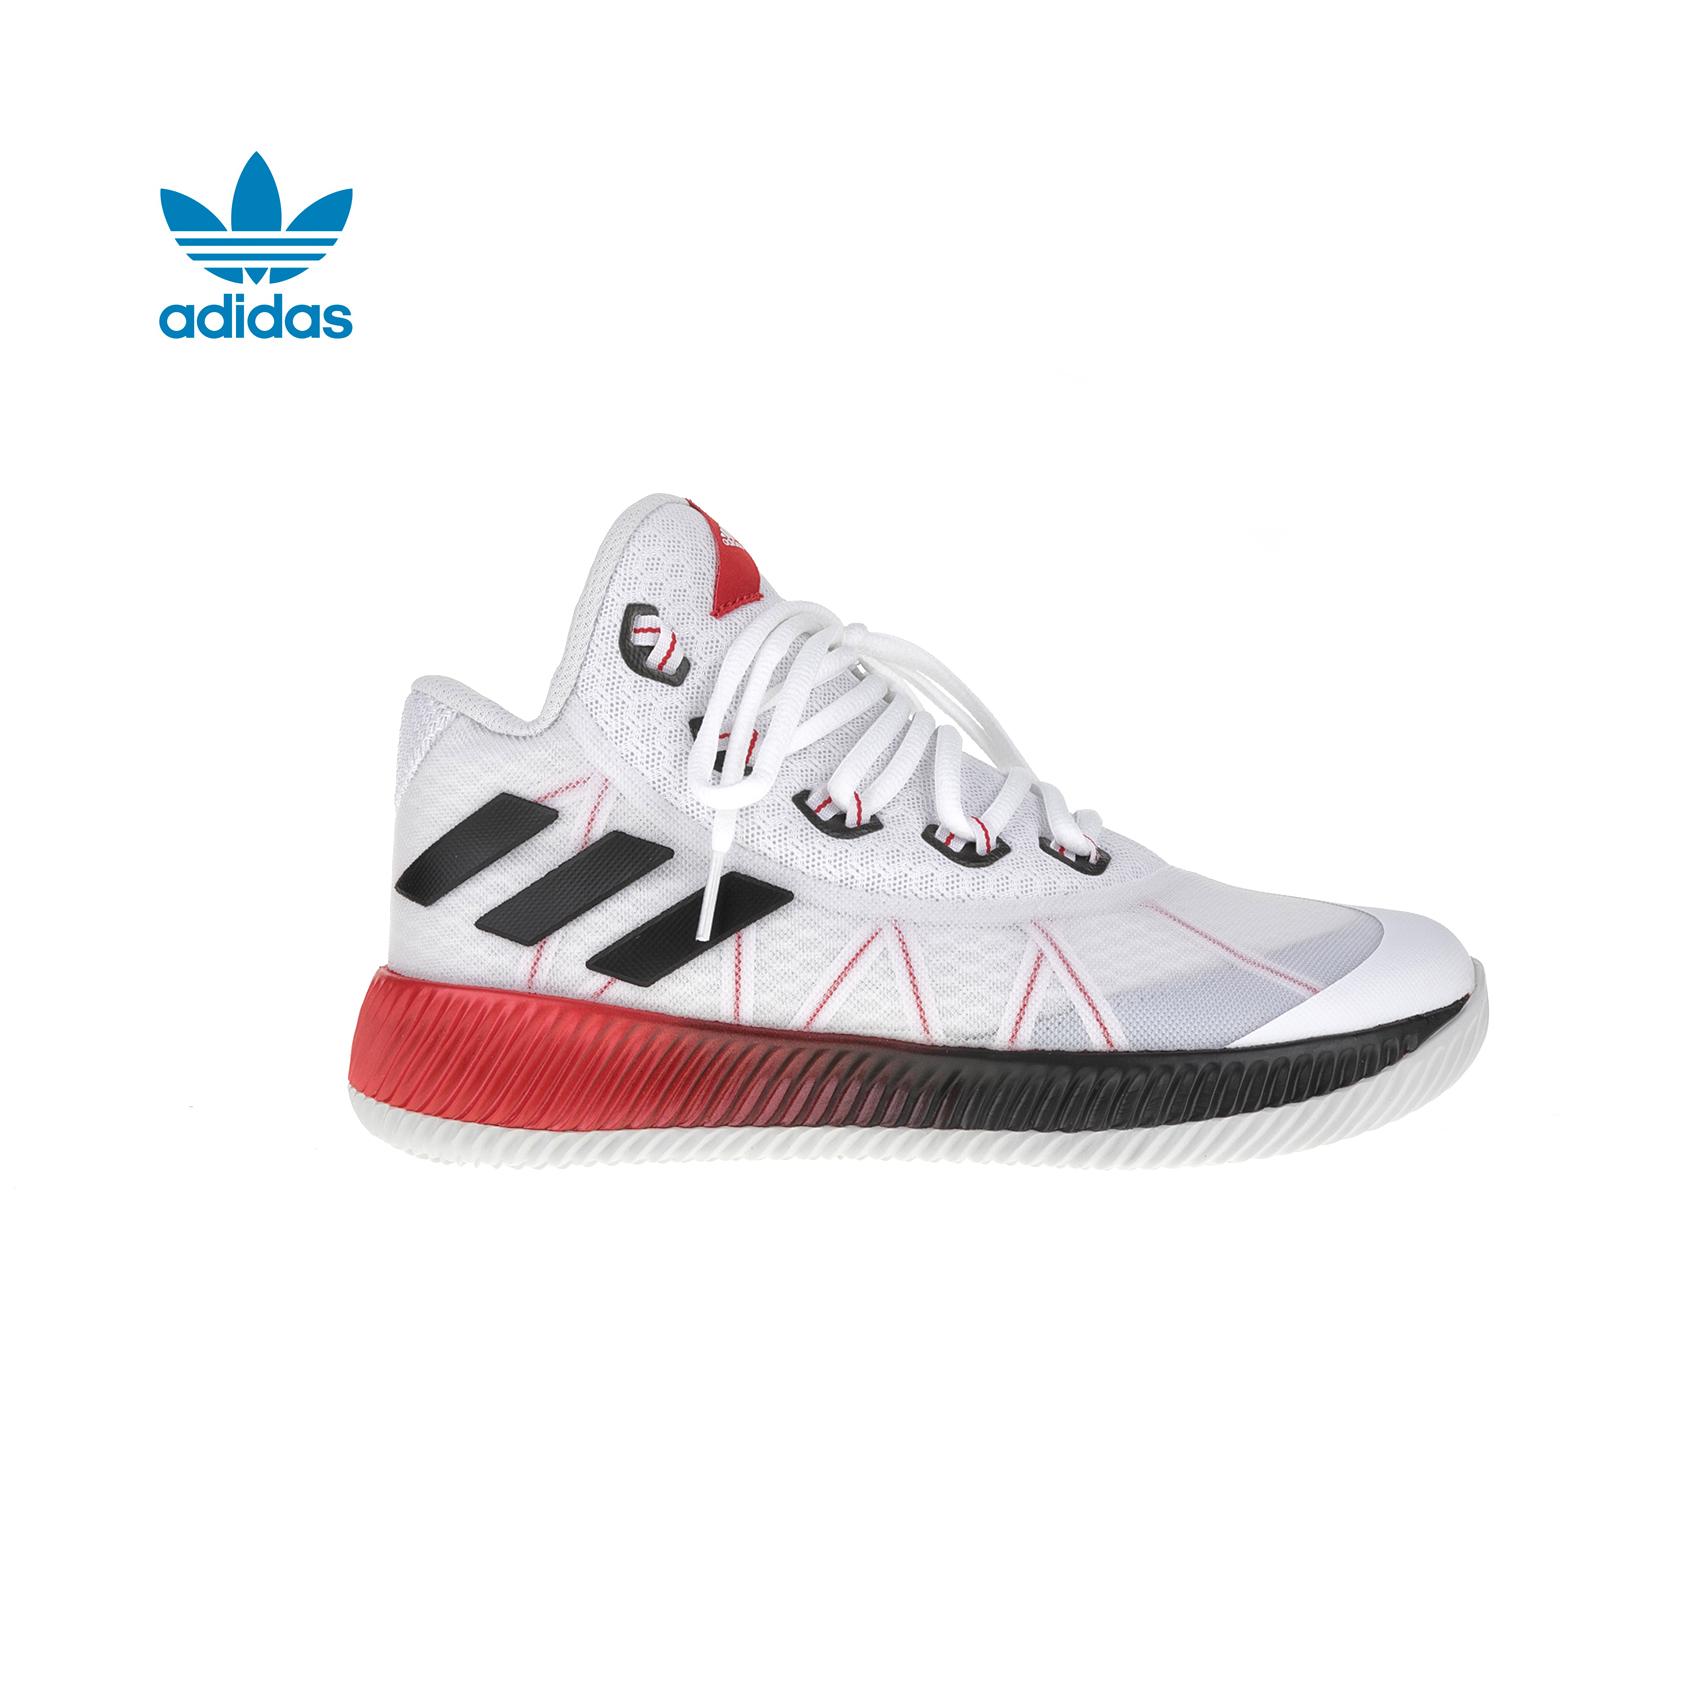 adidas Originals – Παιδικά παπούτσια μπάσκετ adidas Light Em Up 2017 J λευκά